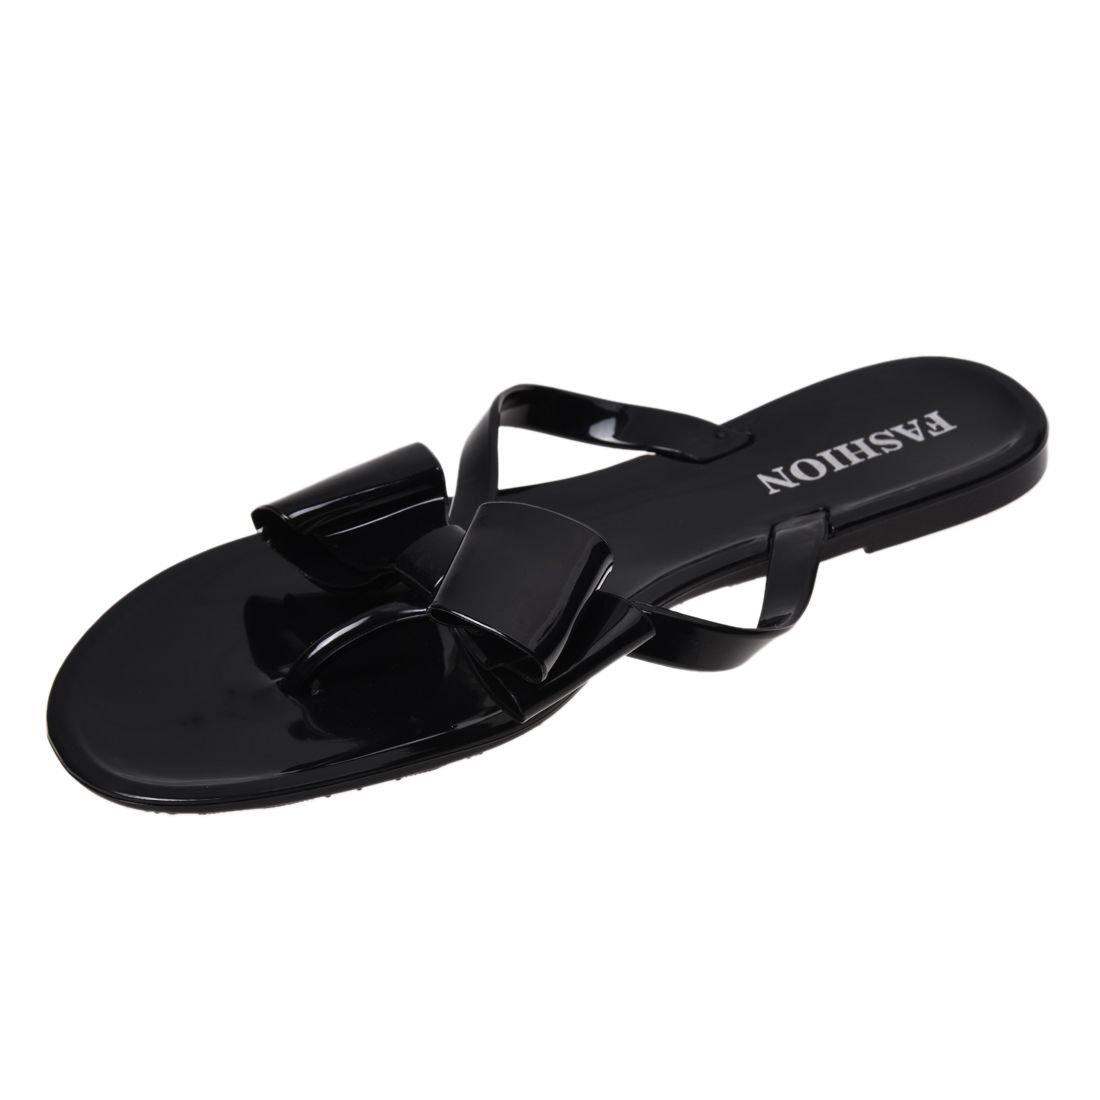 4486a6c0209b TOOGOO(R) Women s Sandals Summer Beach fashion women s bow flat heel flip  flops beach slippers flip female shoes size6 black  Amazon.co.uk  Shoes    Bags